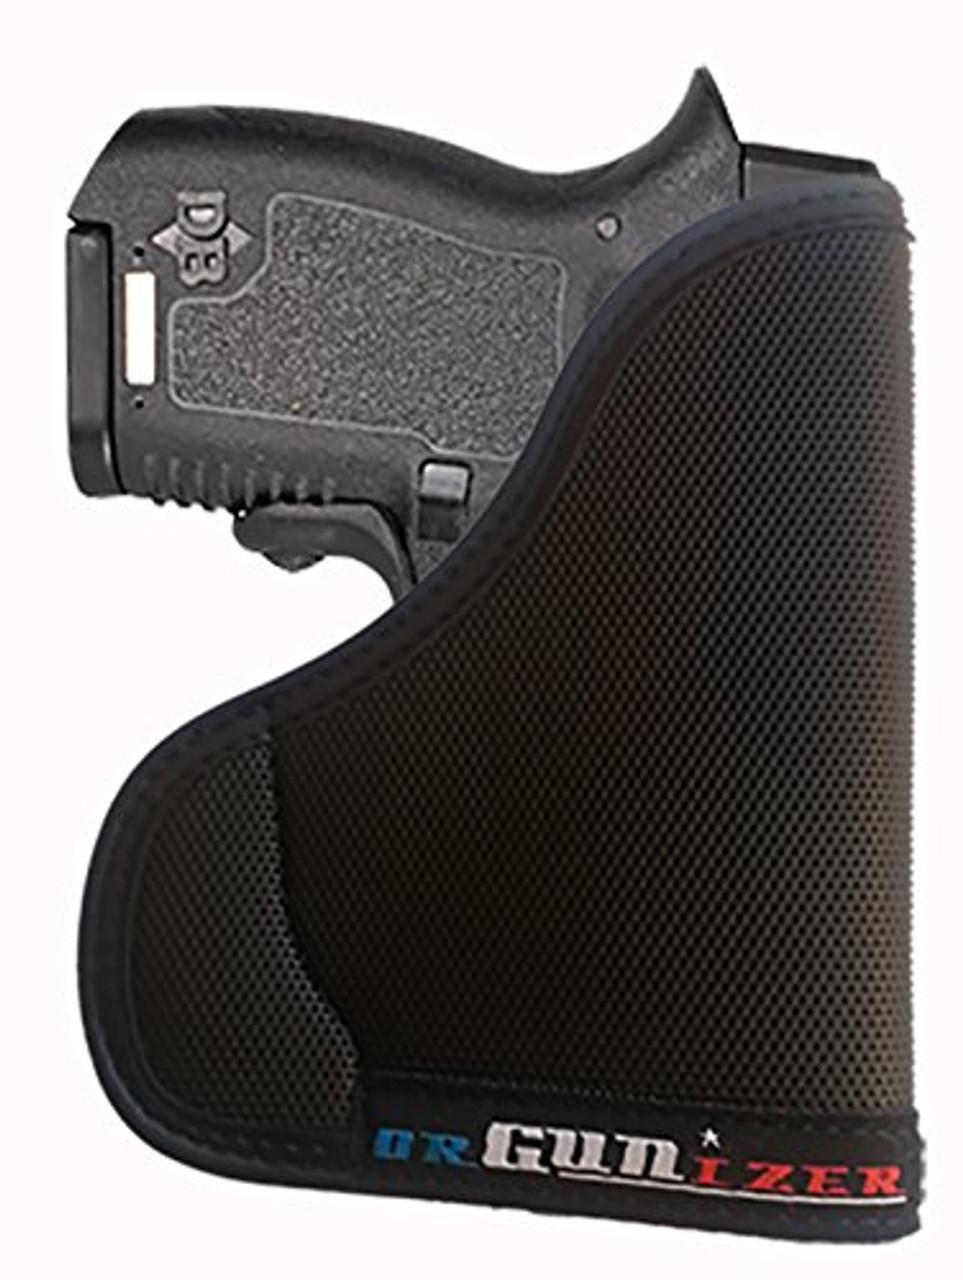 Diamondback DB380 Ambidextrous Custom Fit Leather Trimmed orGUNizer Pocket Holster by Garrison Grip (A)